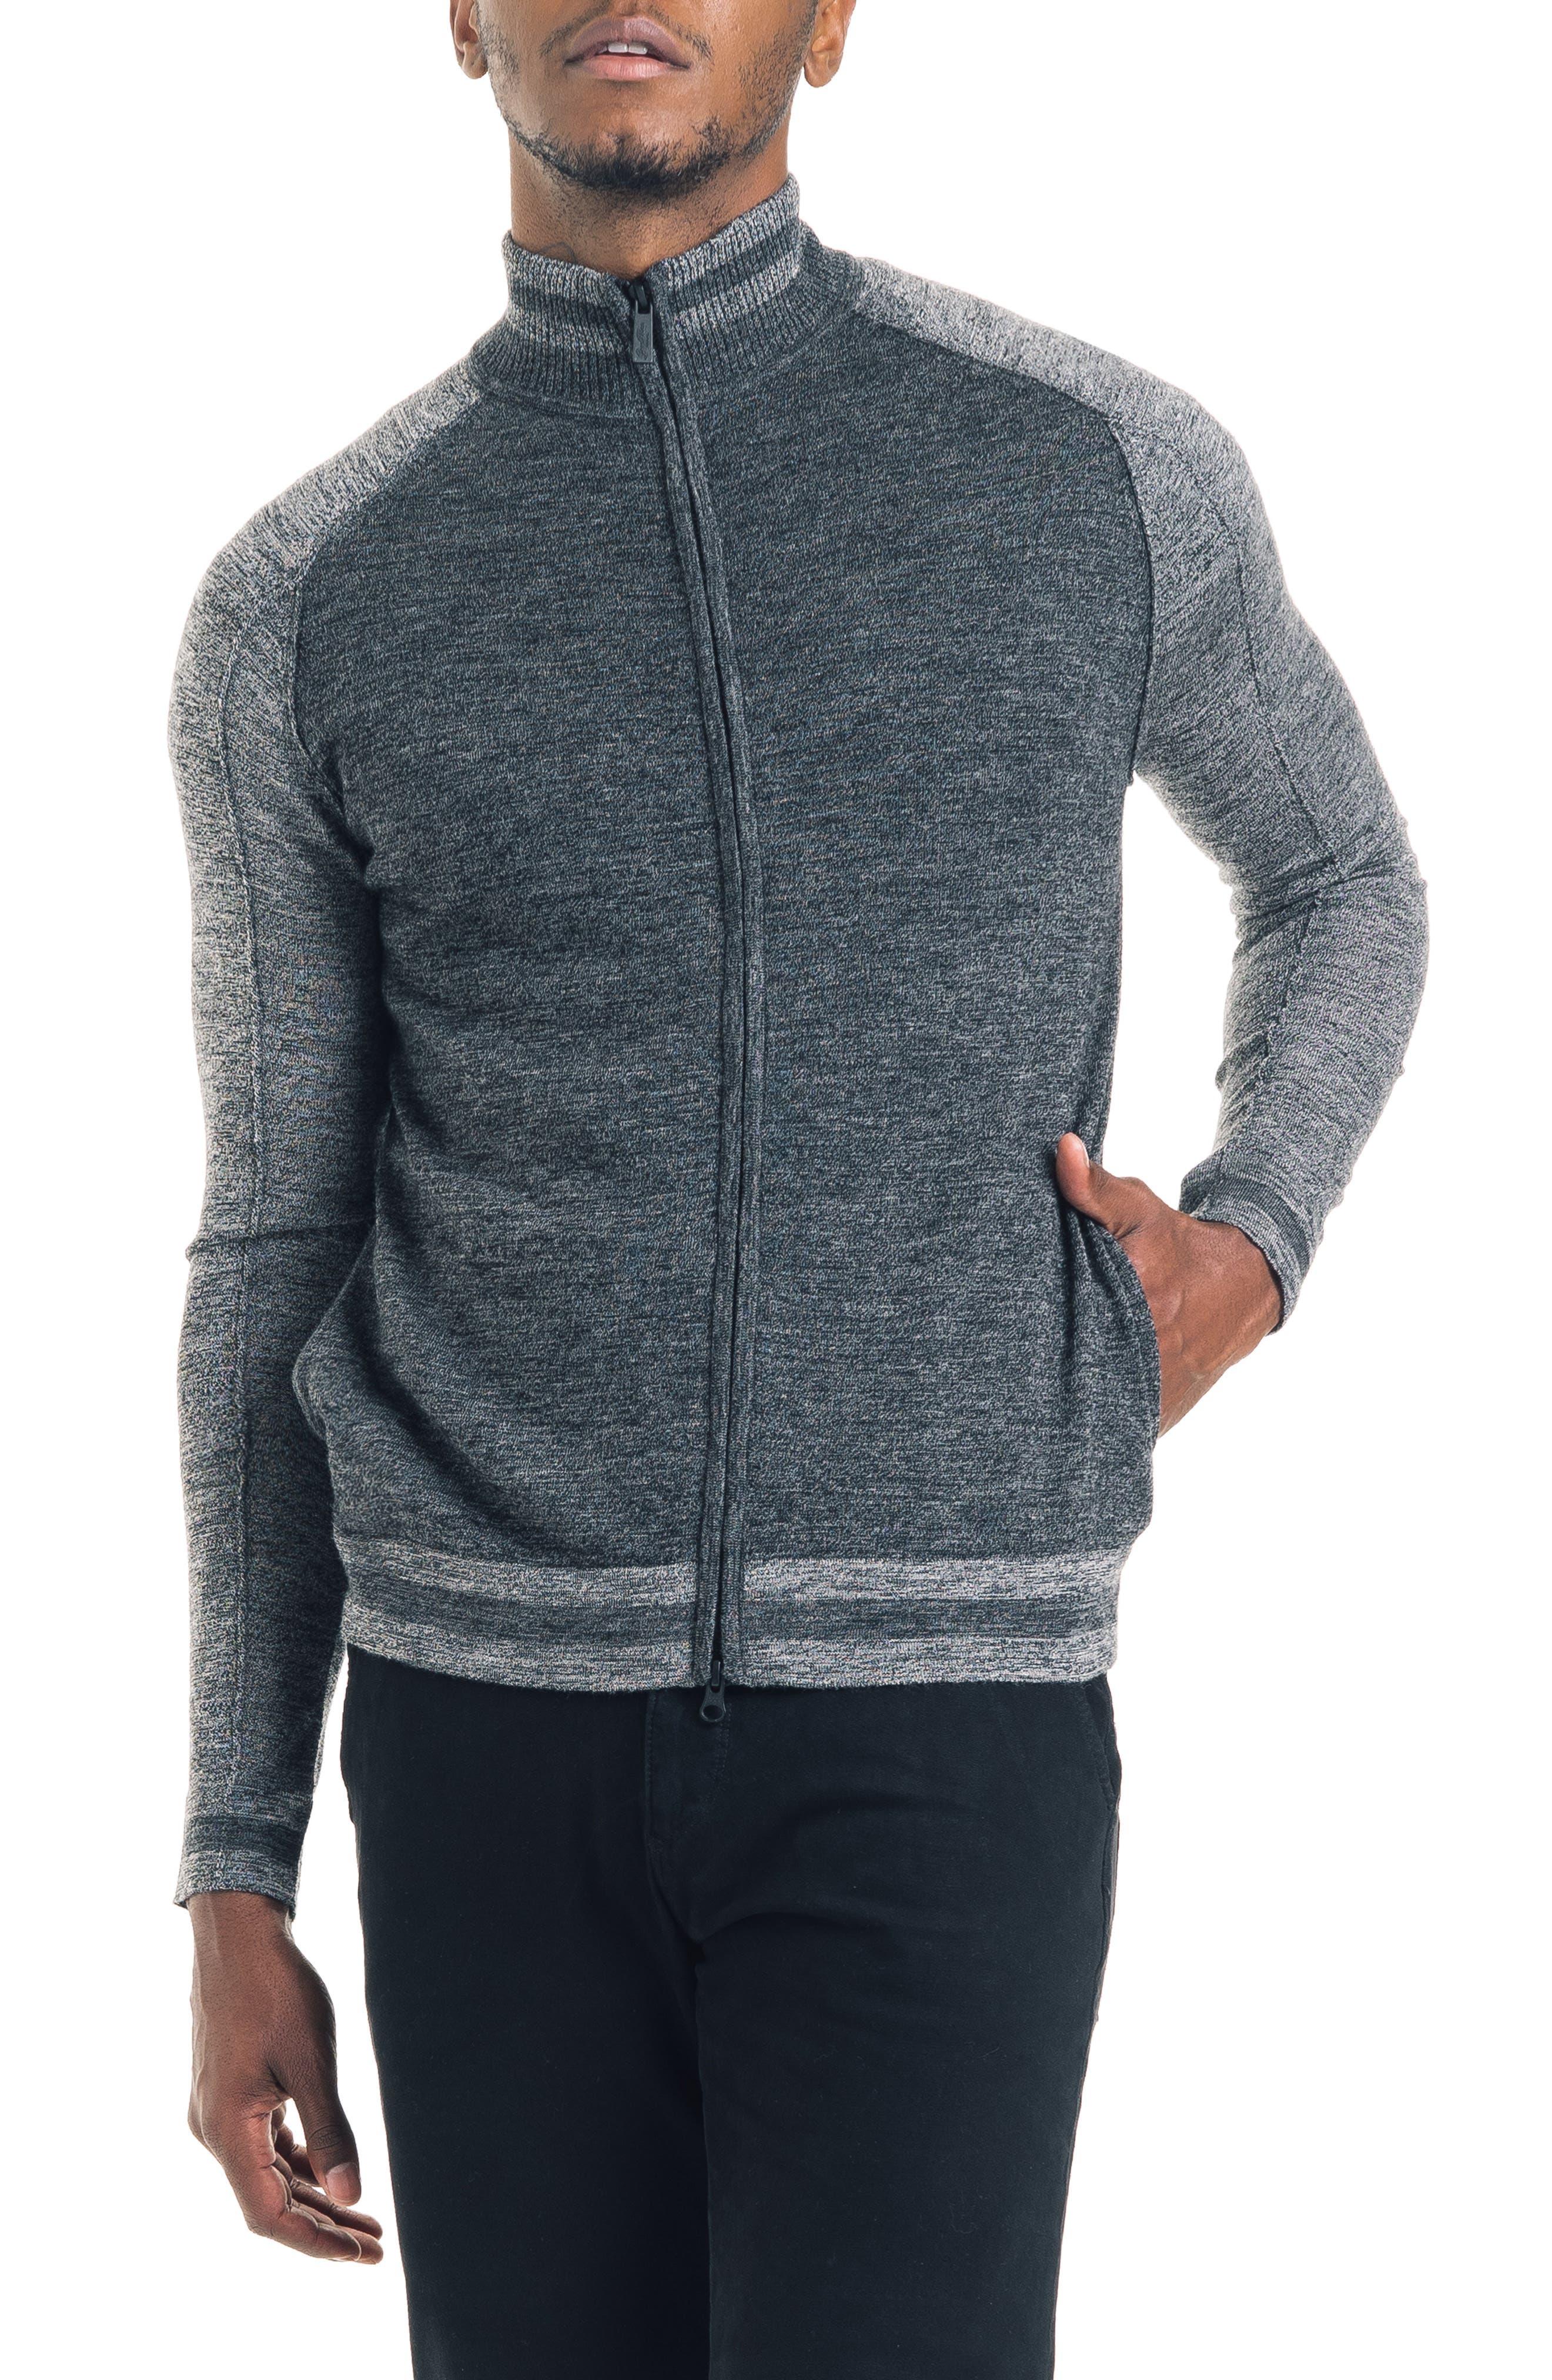 Modern Slim Fit Merino Wool Track Jacket,                             Main thumbnail 1, color,                             BLACK